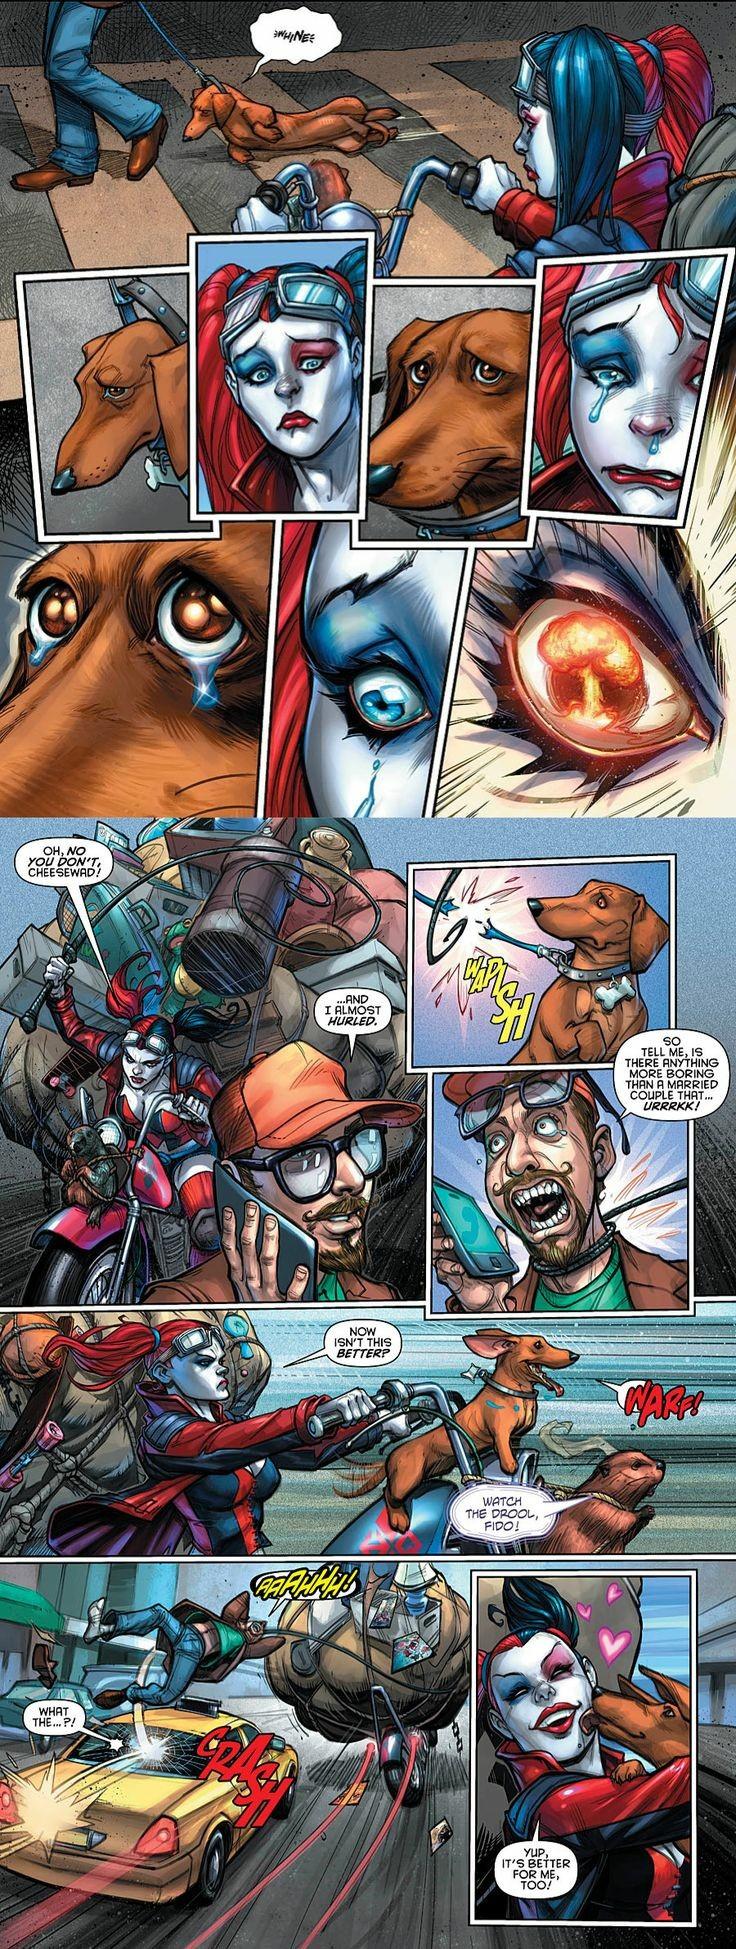 Harley Saves Doggo